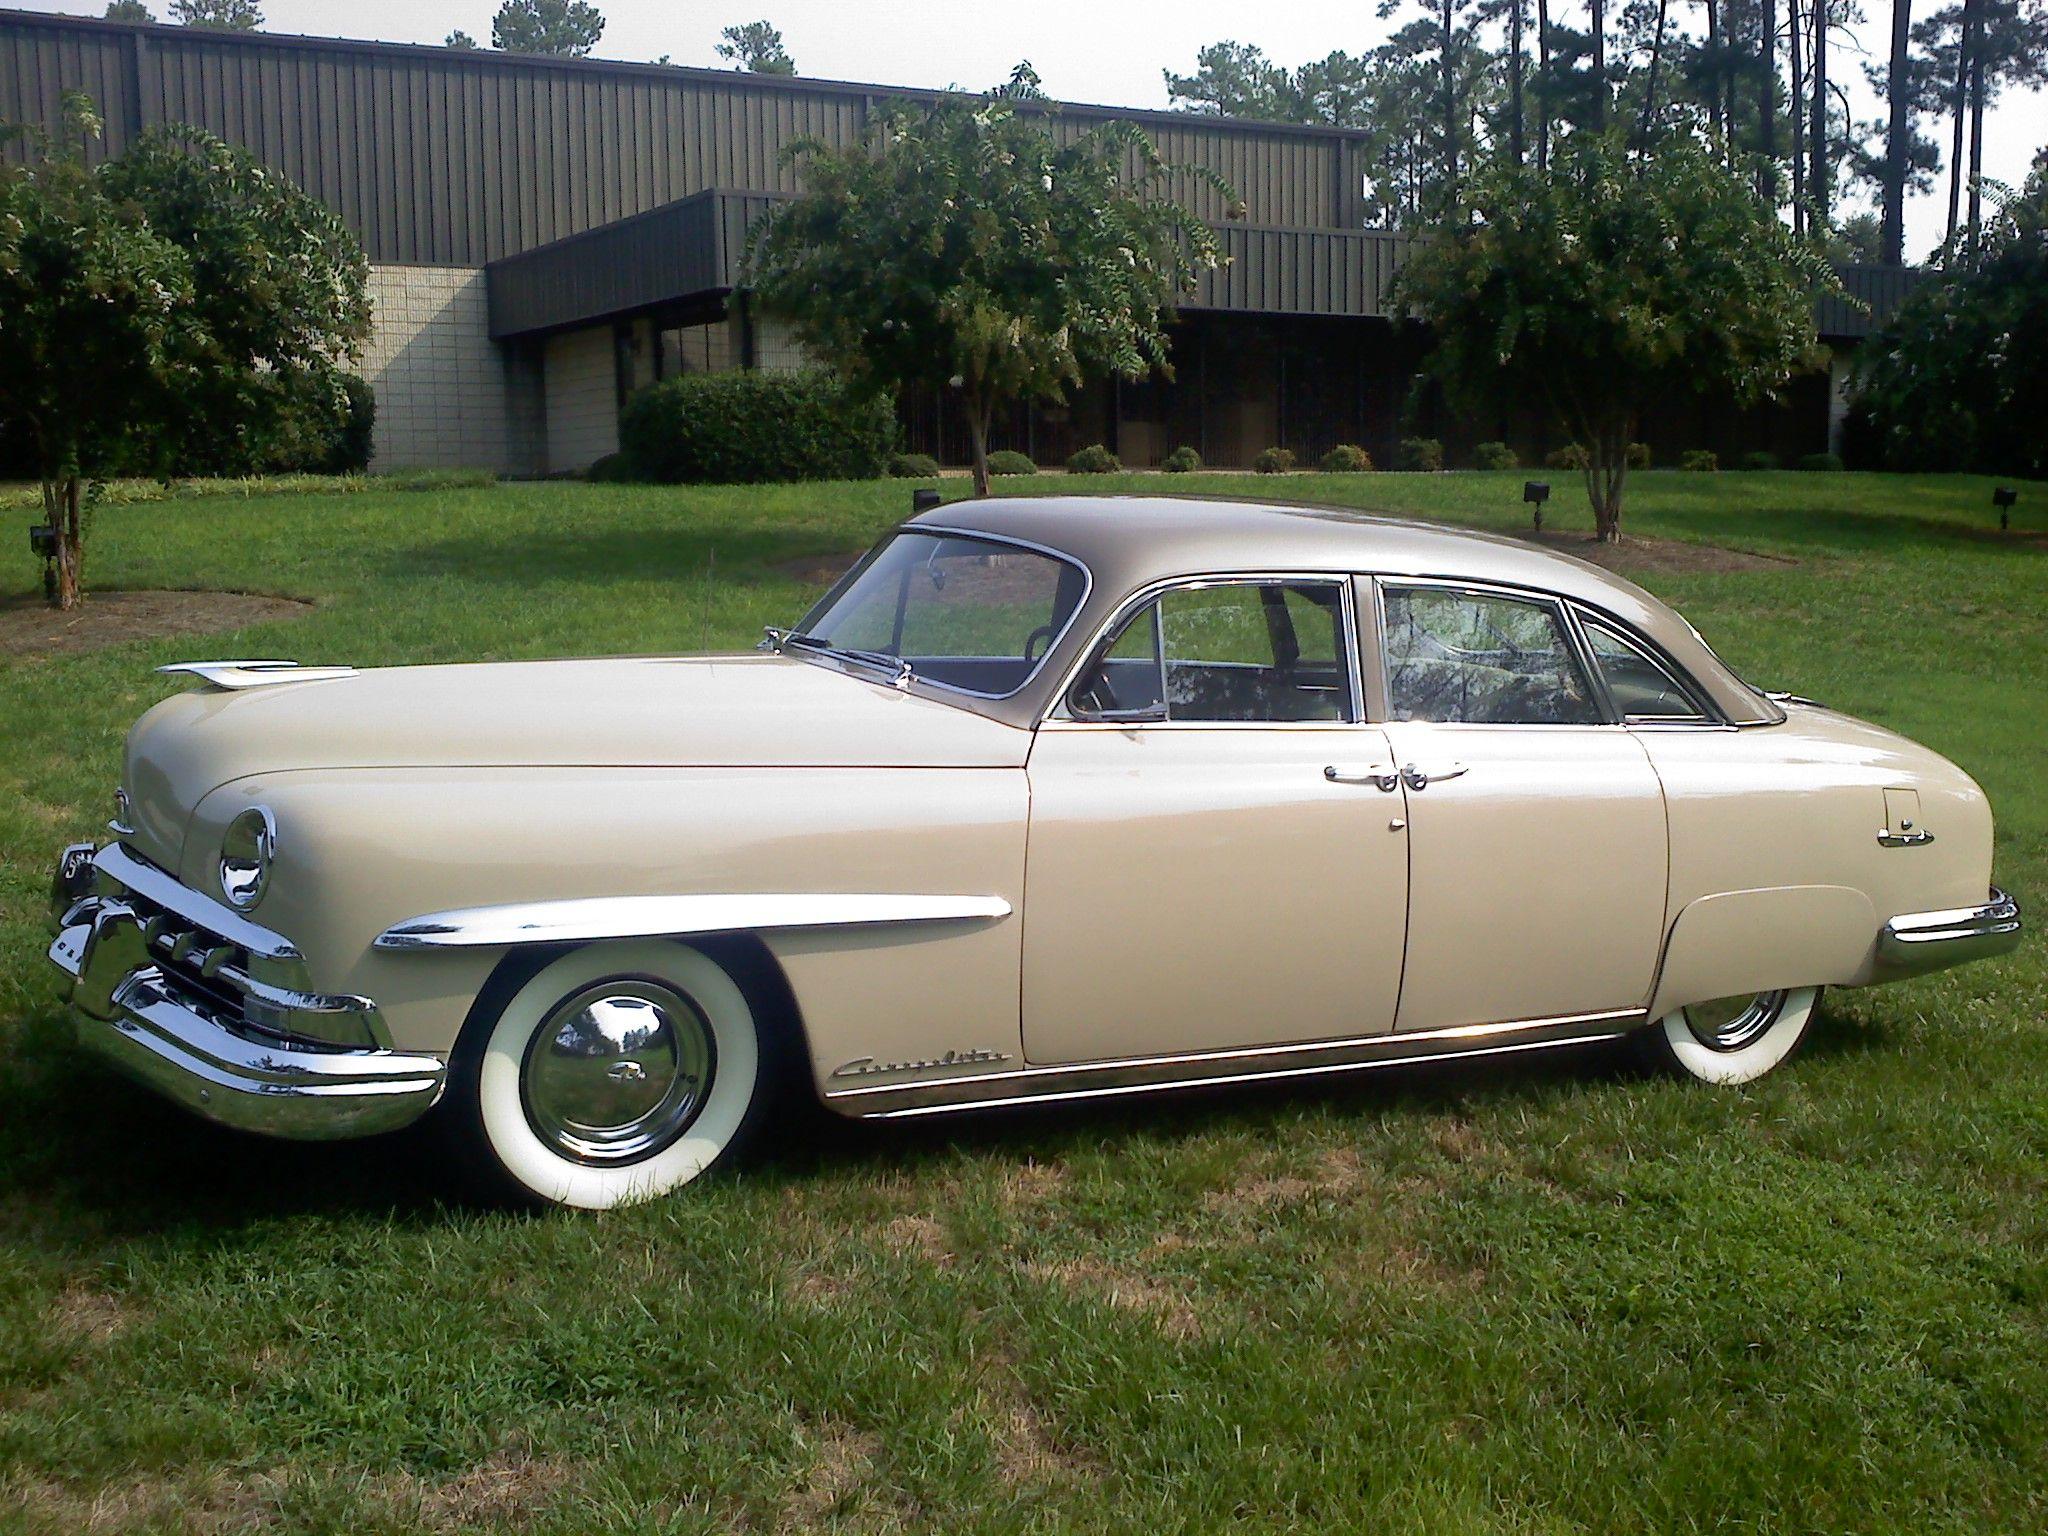 Classic Cars for Sale 1950 Lincoln Cosmopolitan